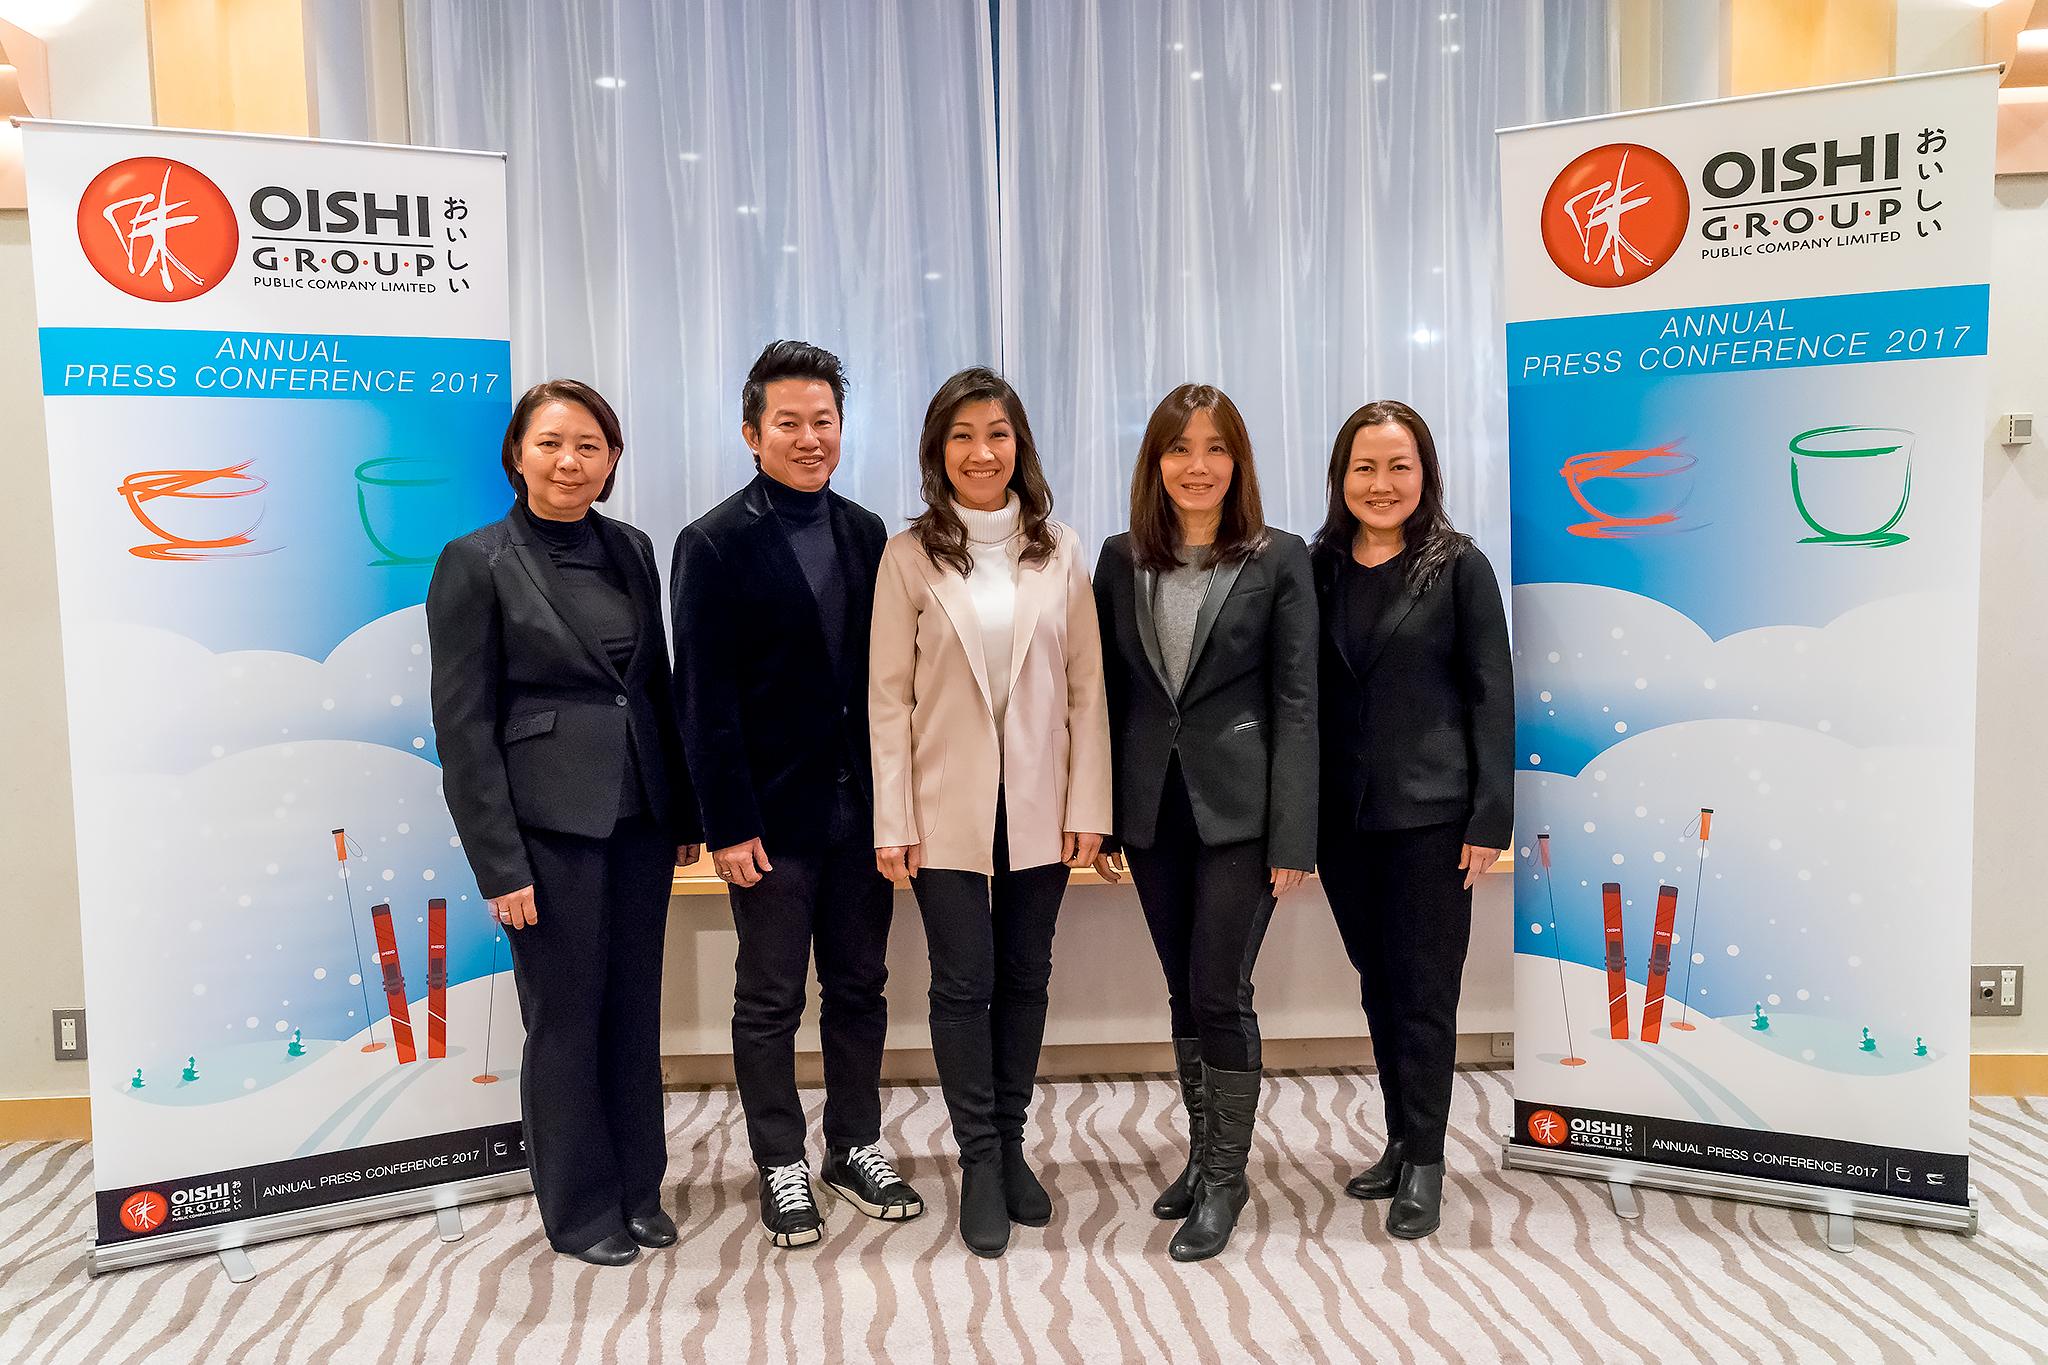 OISHI Annual Press Conference 2017